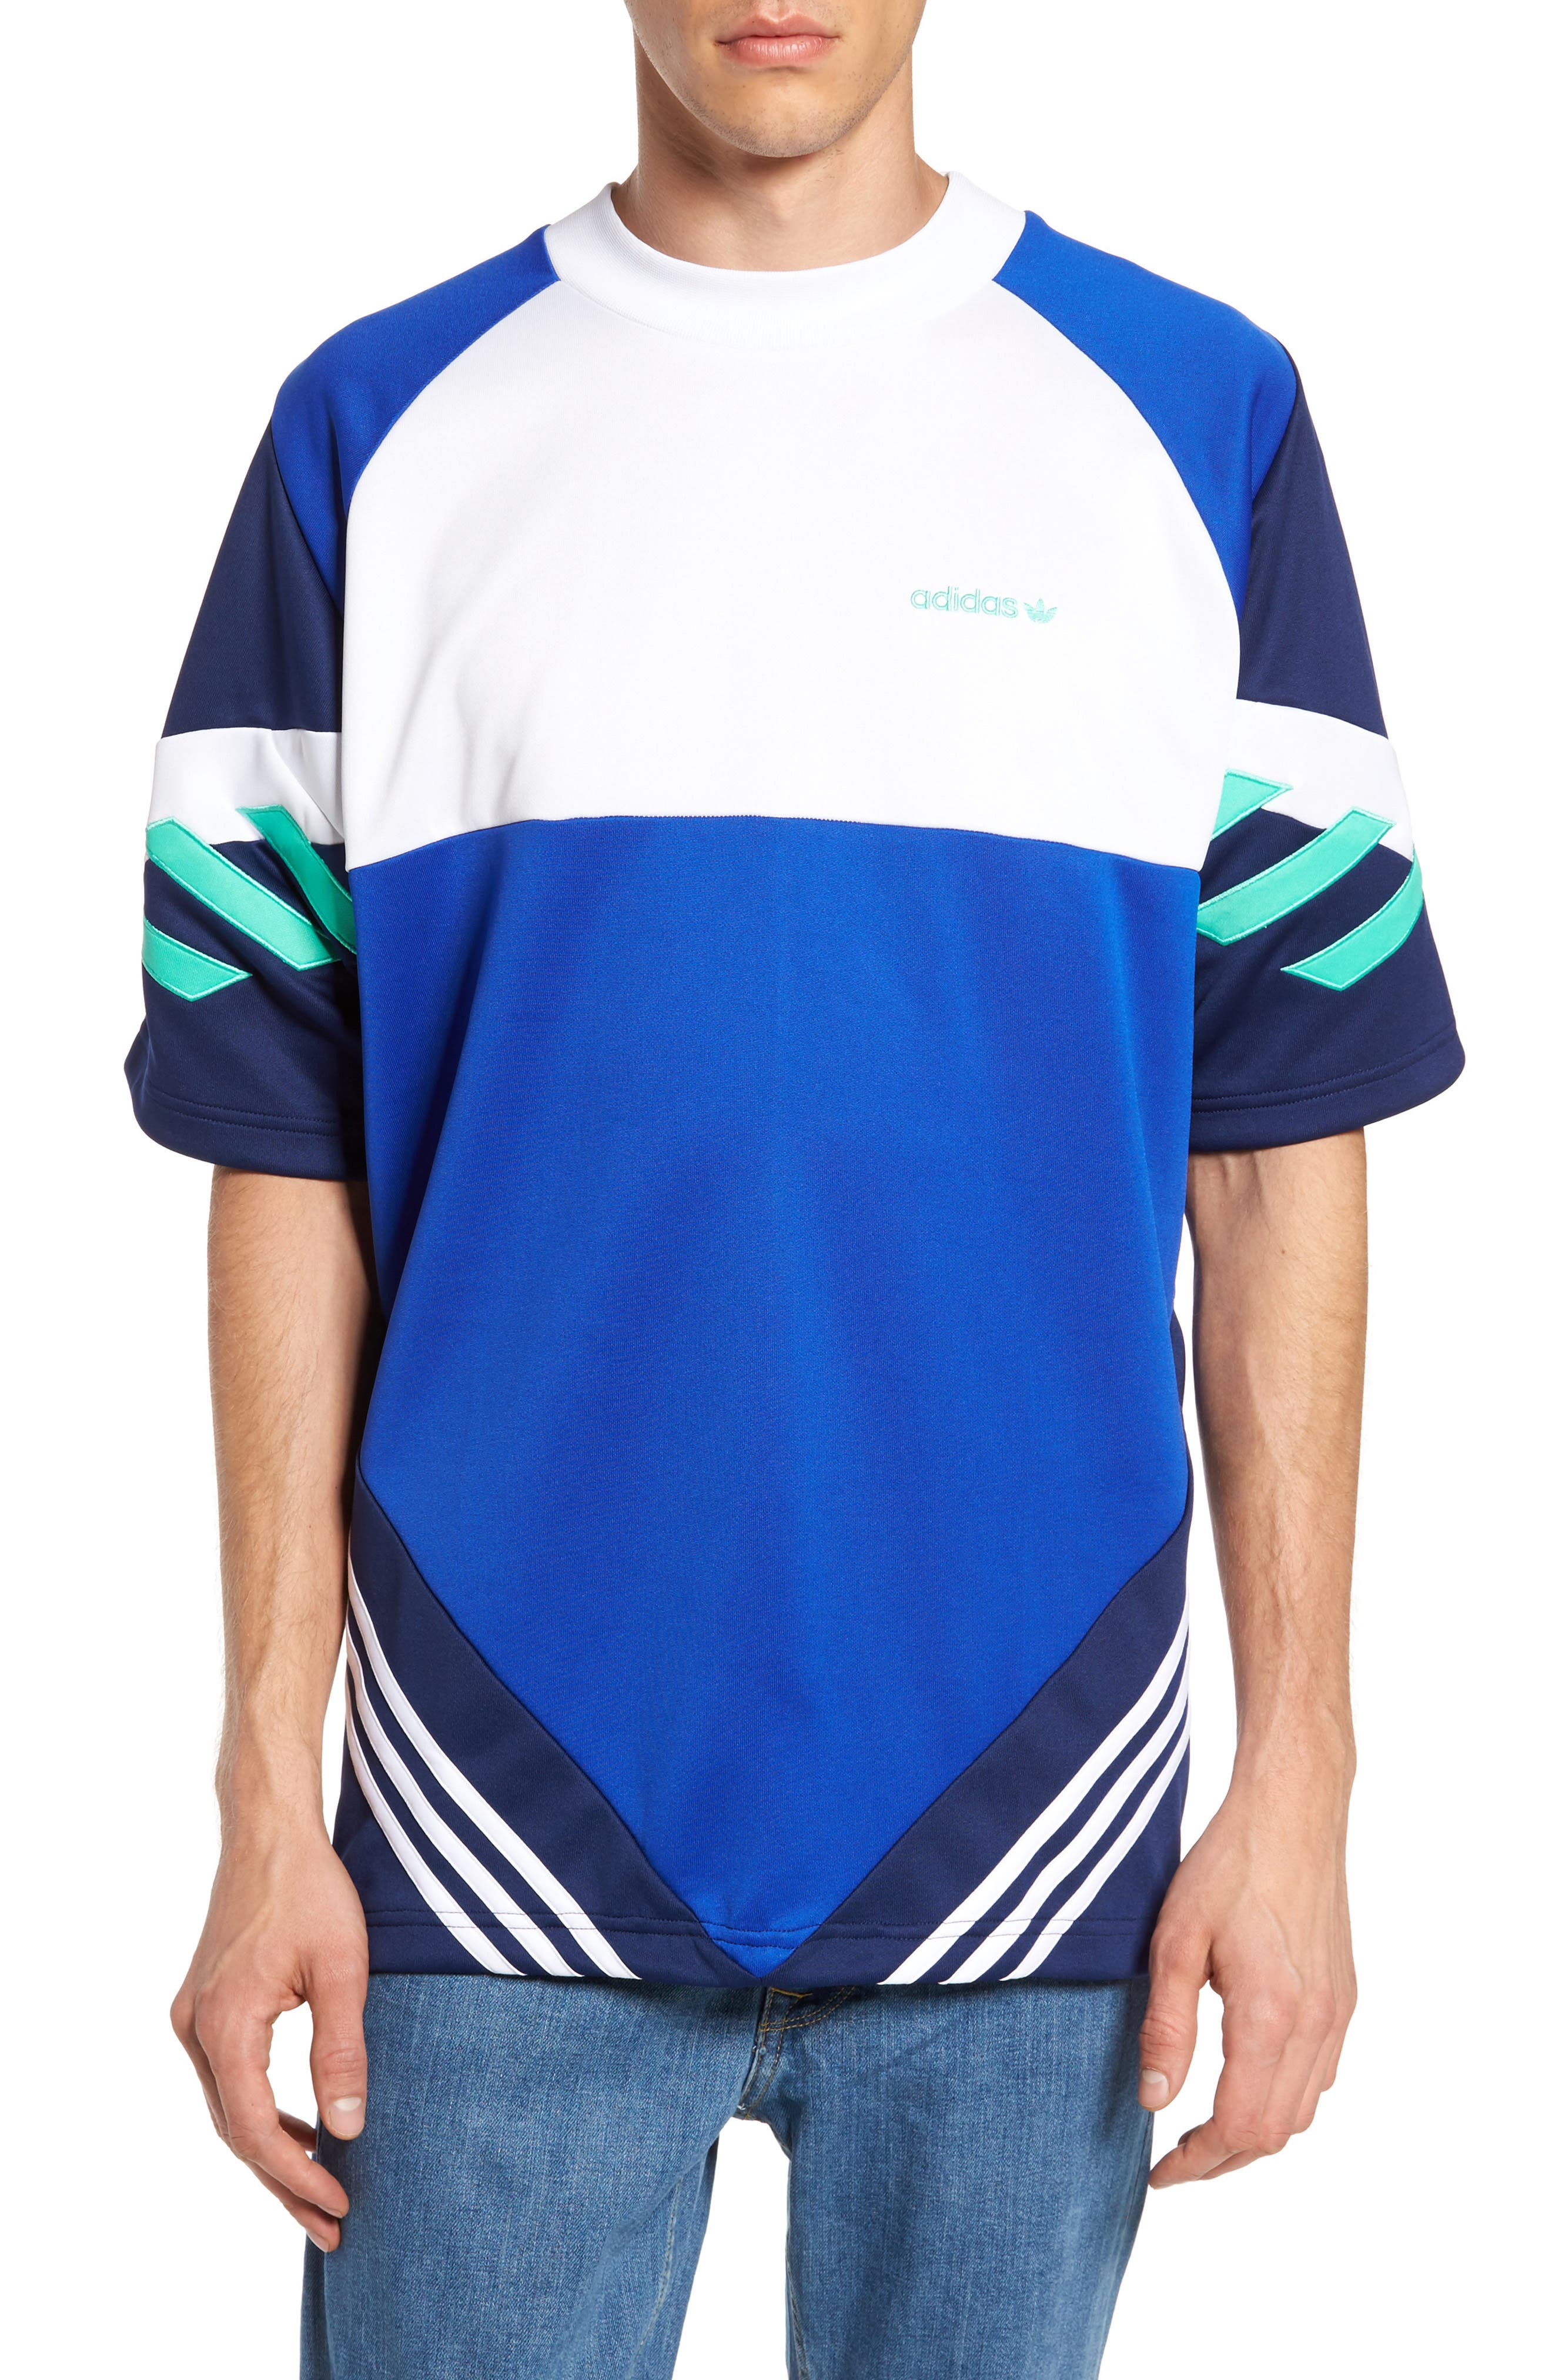 Main Image - adidas Originals Chop Shop T-Shirt